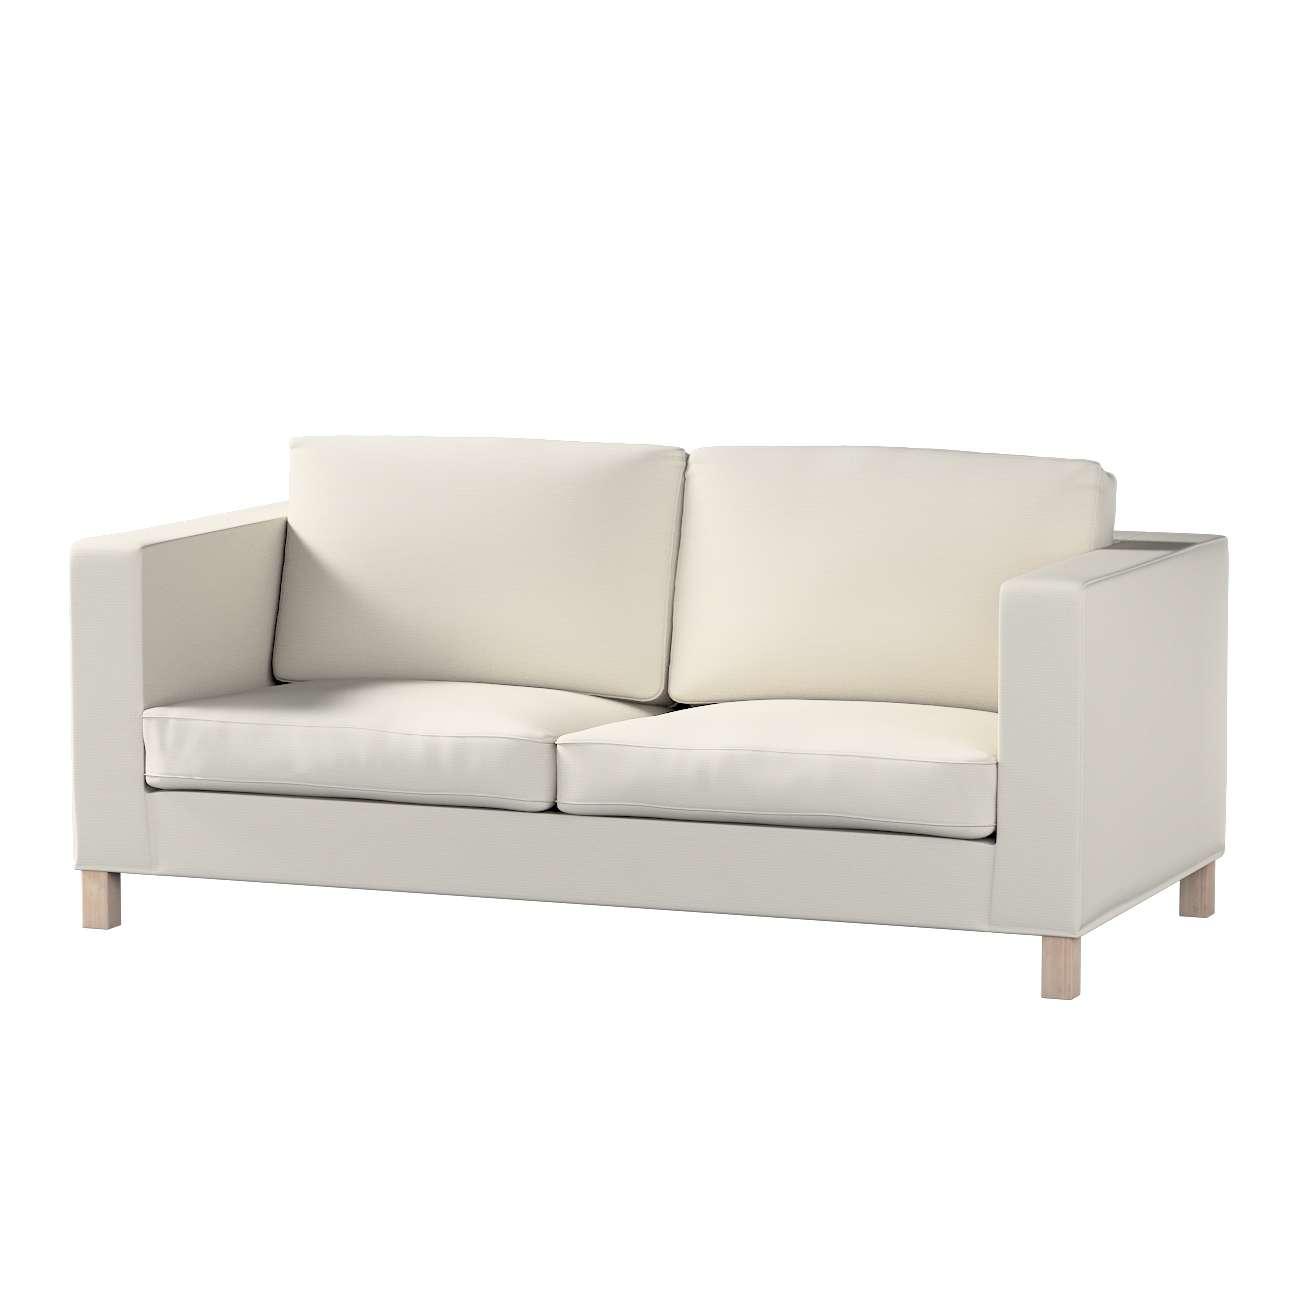 Potah na pohovku IKEA  Karlanda rozkládací, krátký pohovka Karlanda rozkládací v kolekci Cotton Panama, látka: 702-31